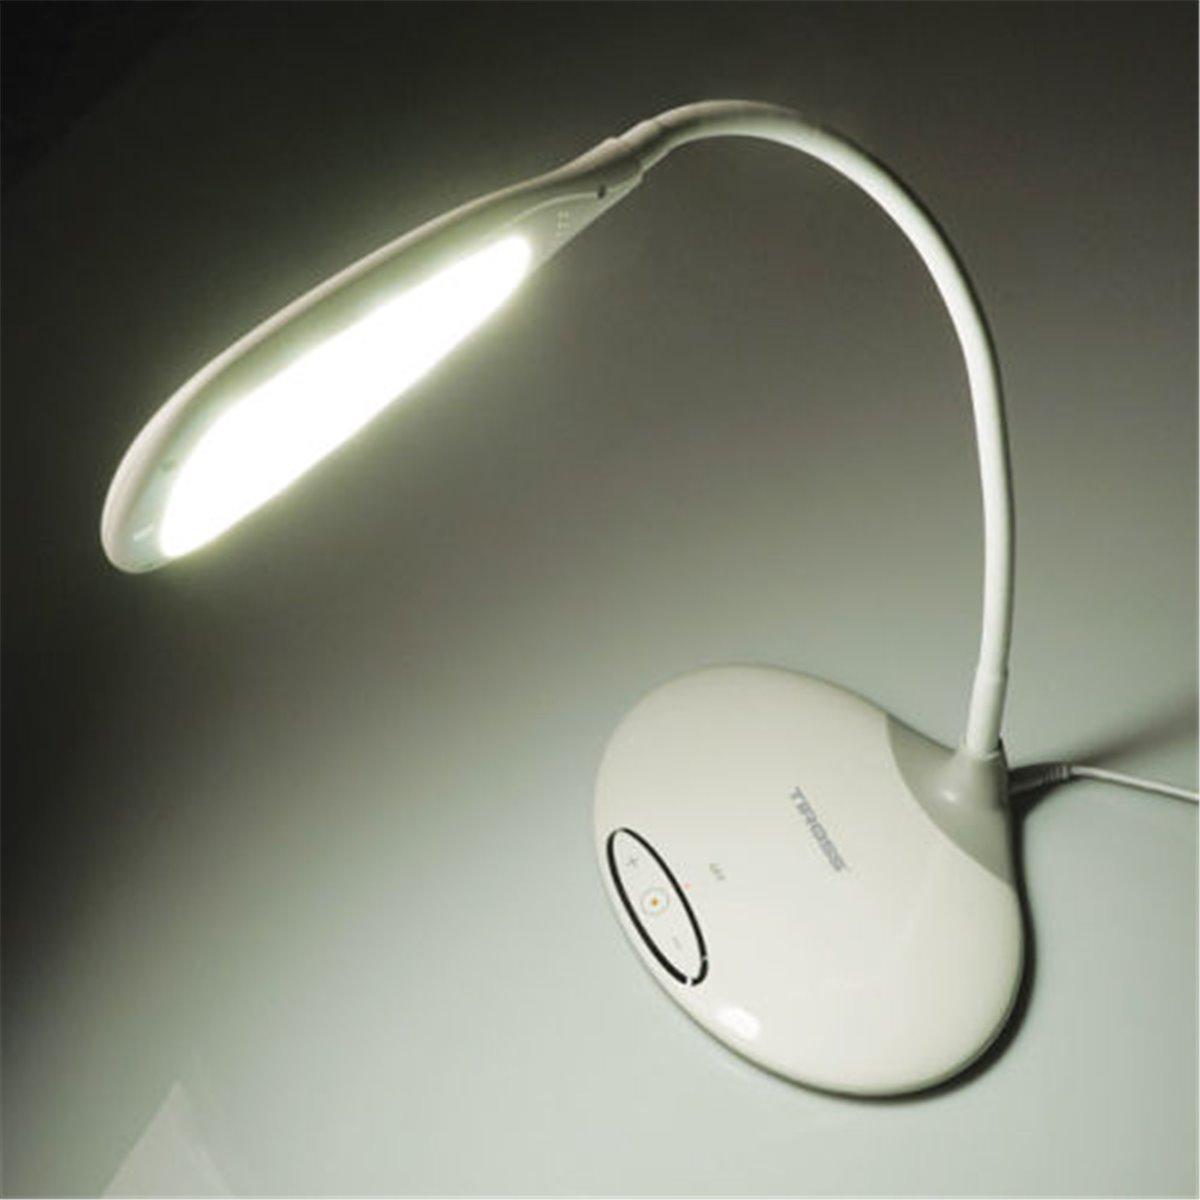 Лампа Tiross TS 1802